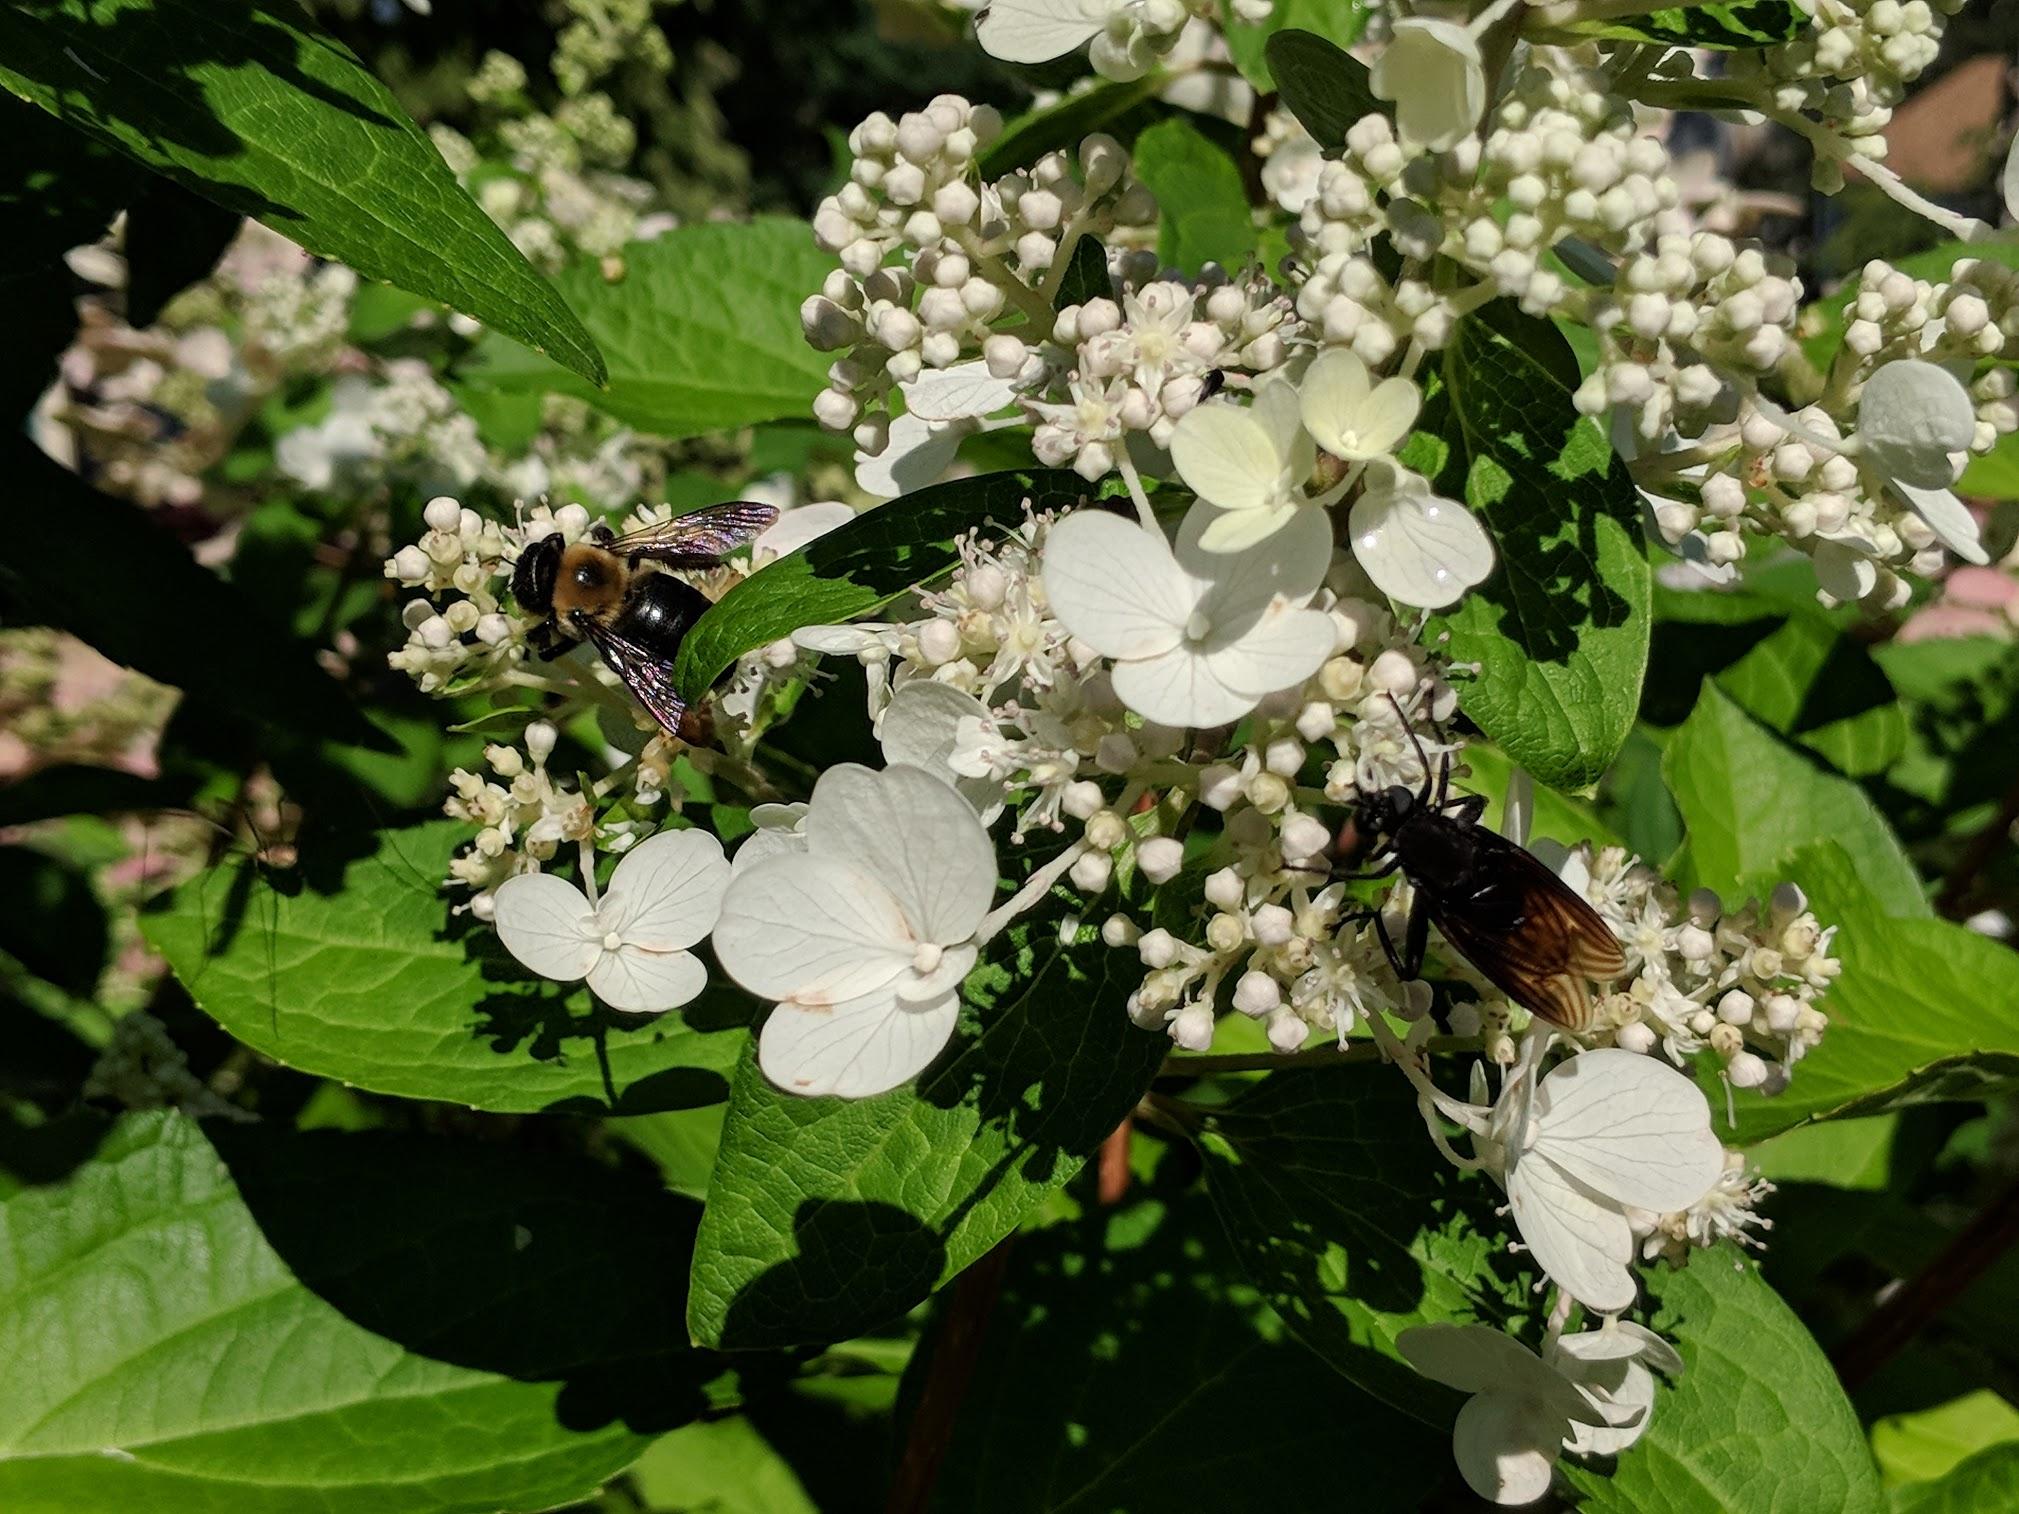 Bombus and wasp on Hydrangea